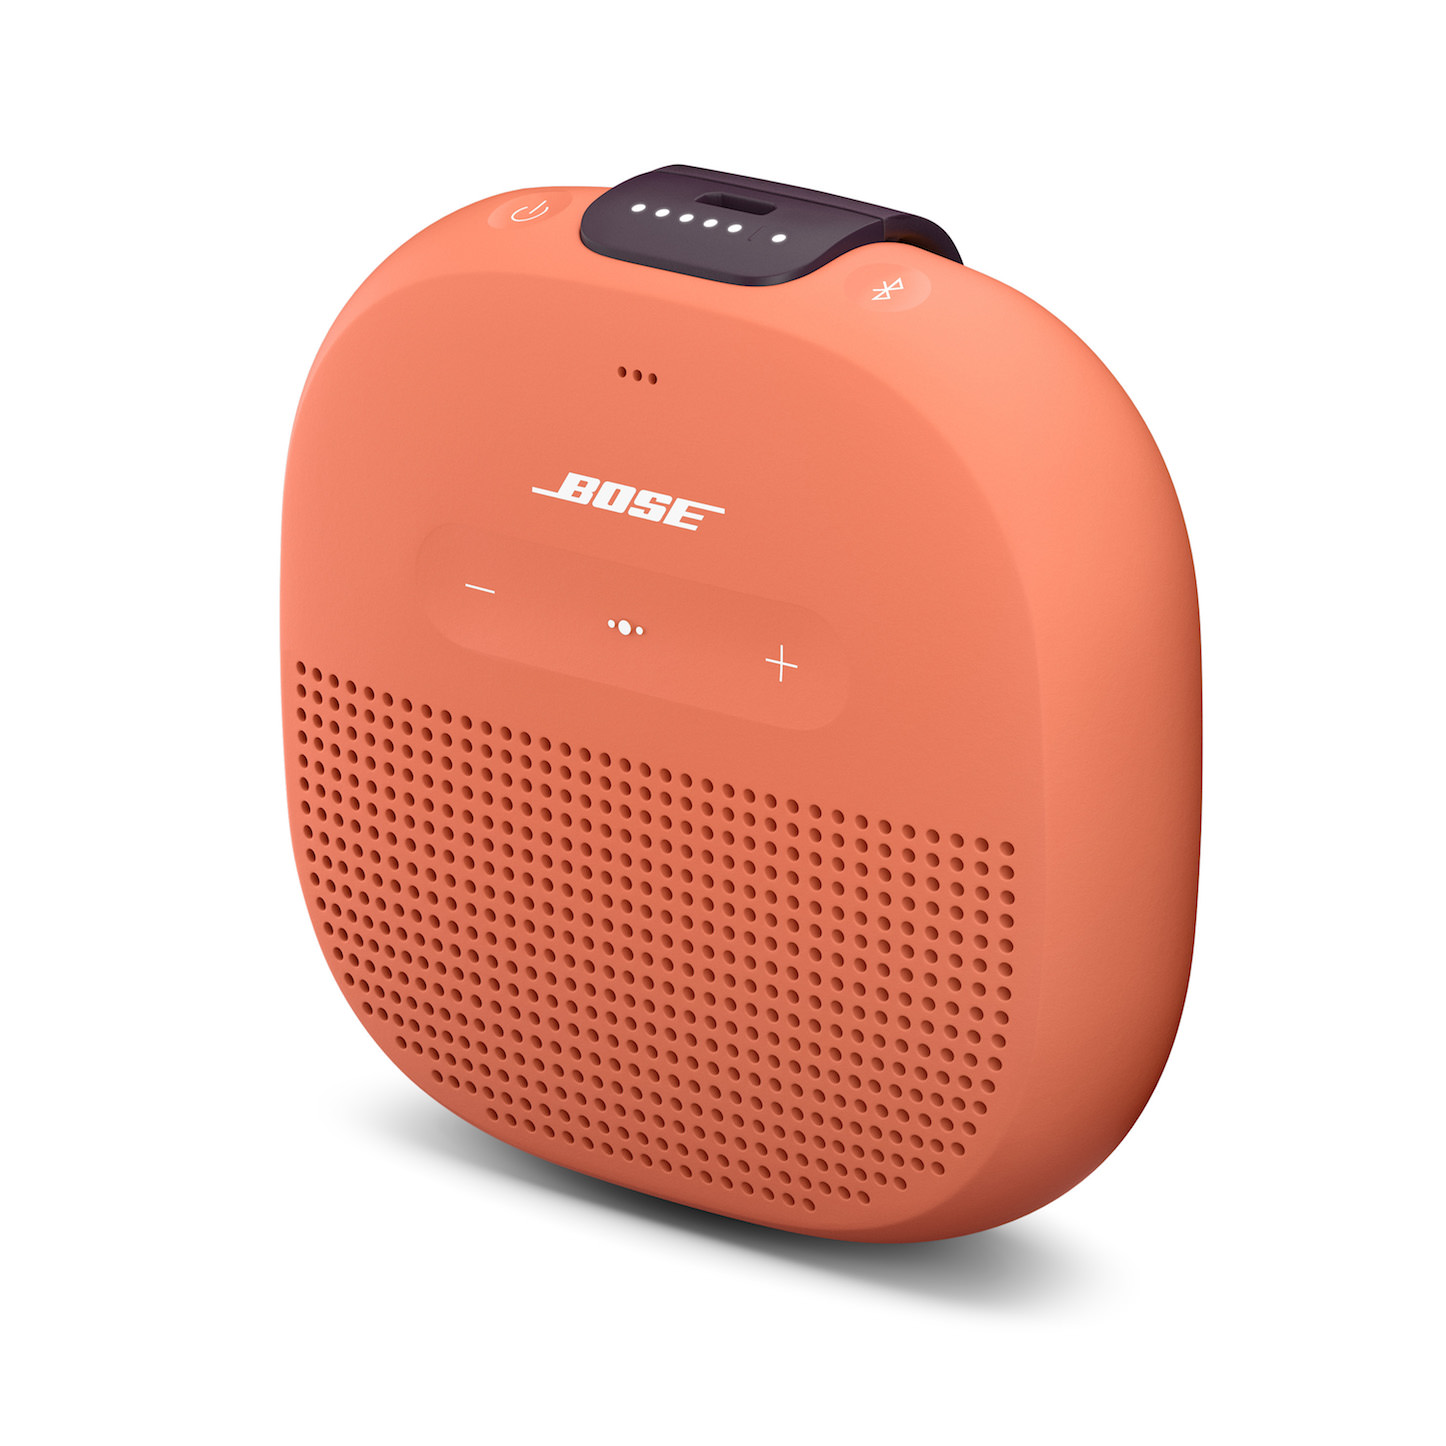 SoundLink-Micro-Bluetooth-Speaker_1854_6.jpg